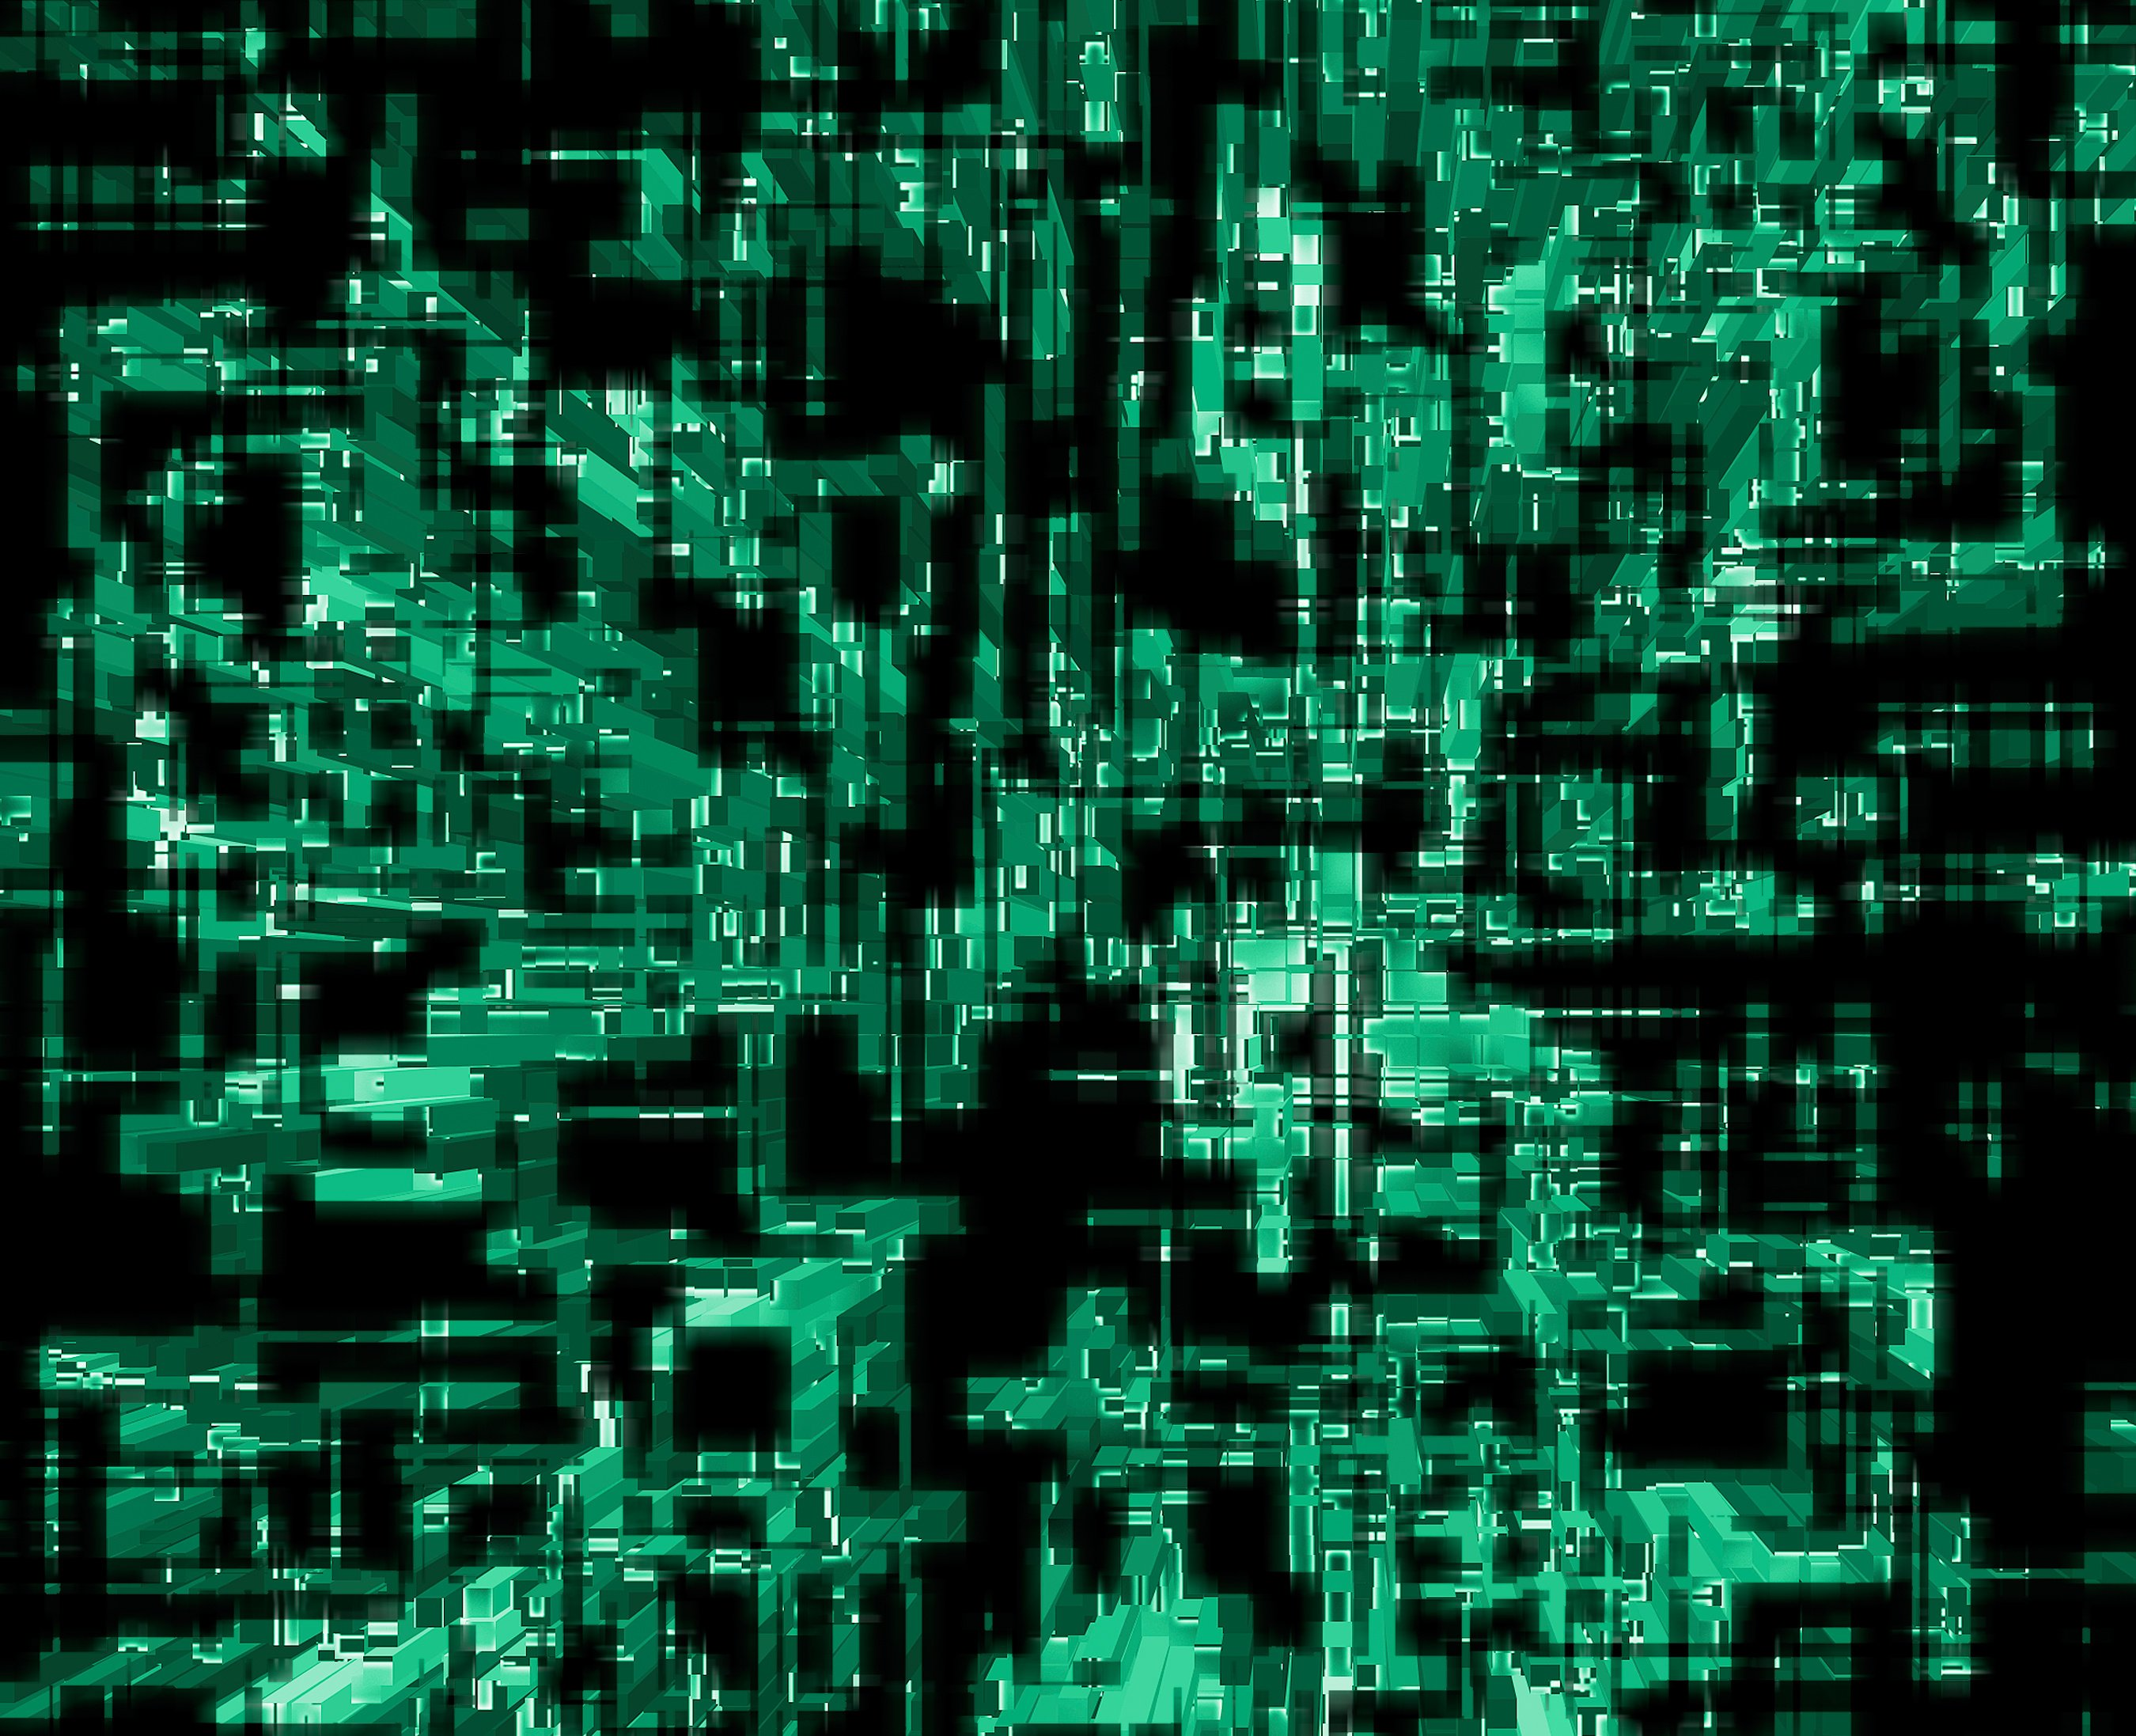 hacker hacking hack anarchy virus internet computer sadic anonymous dark code binary wallpaper 2700x2194 678629 wallpaperup